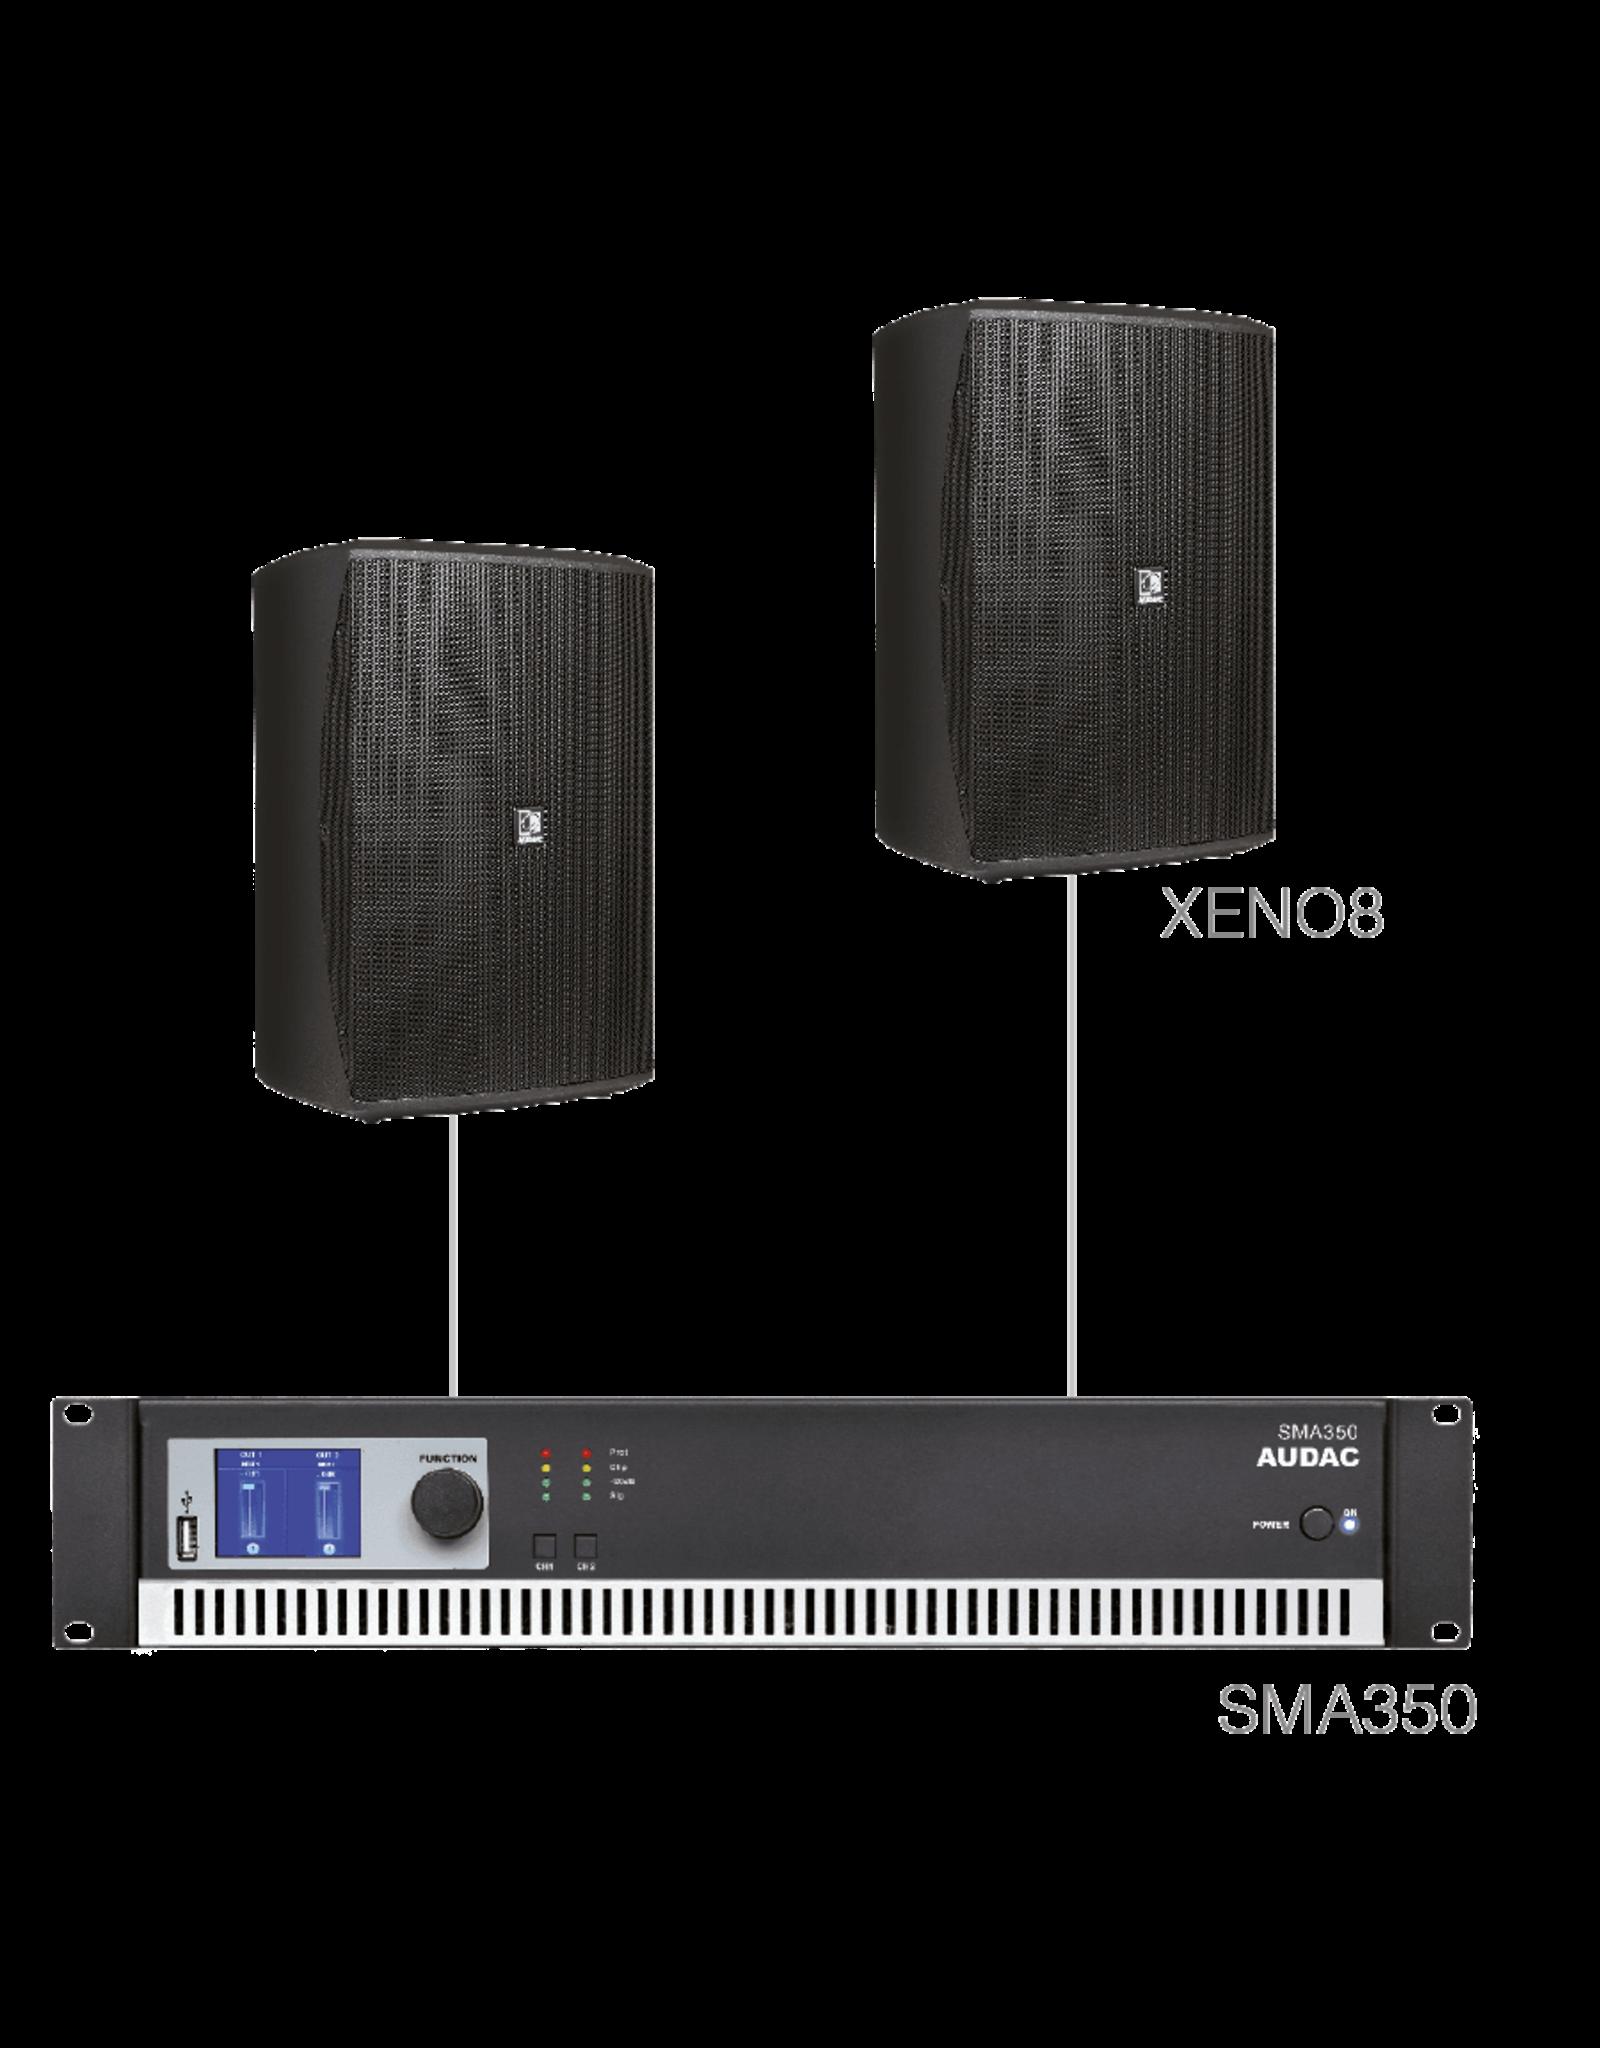 Audac 2 x XENO8 + SMA350 Black version